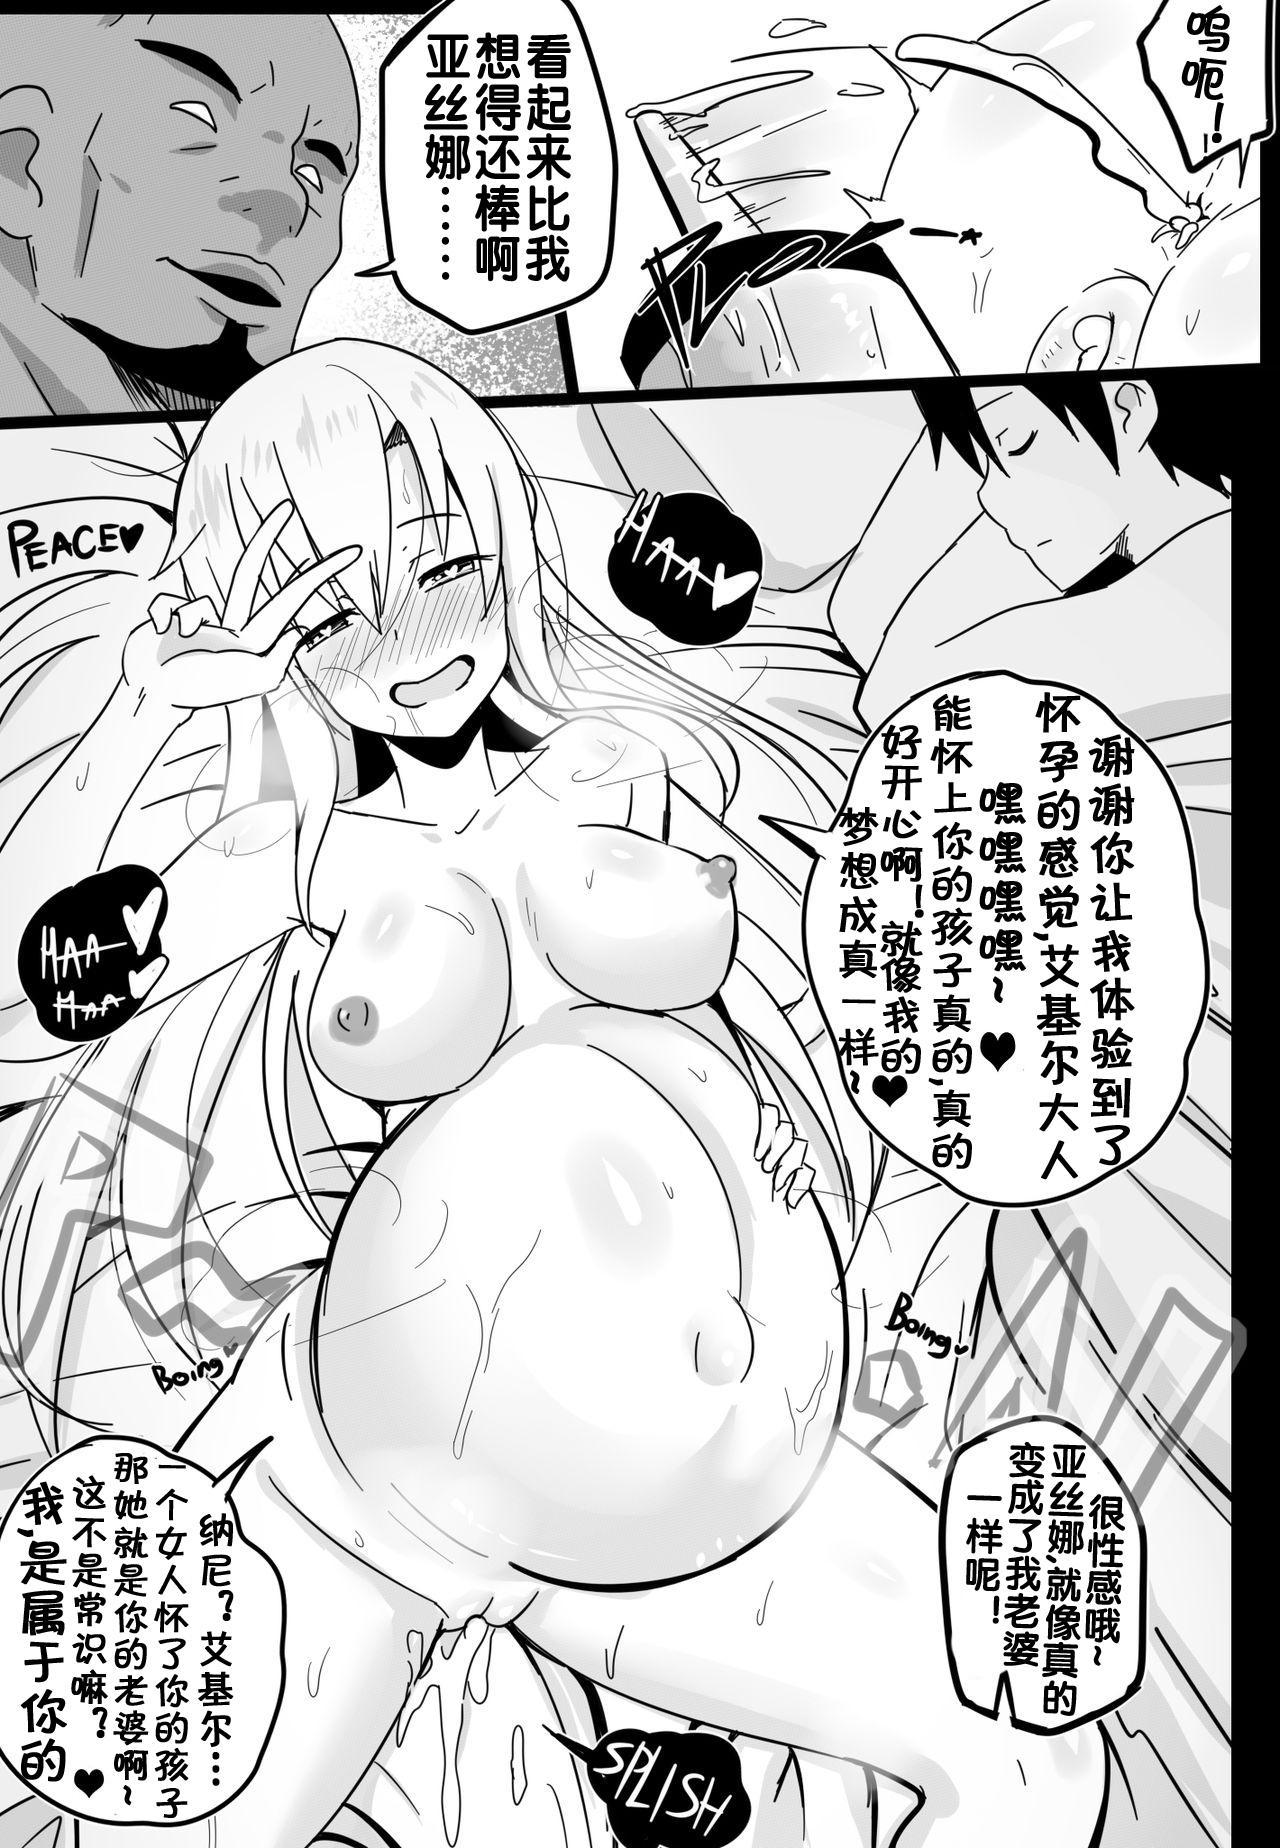 [Merkonig] B-Trayal 19-2 (Sword Art Online) [Chinese] [流木个人汉化] 7